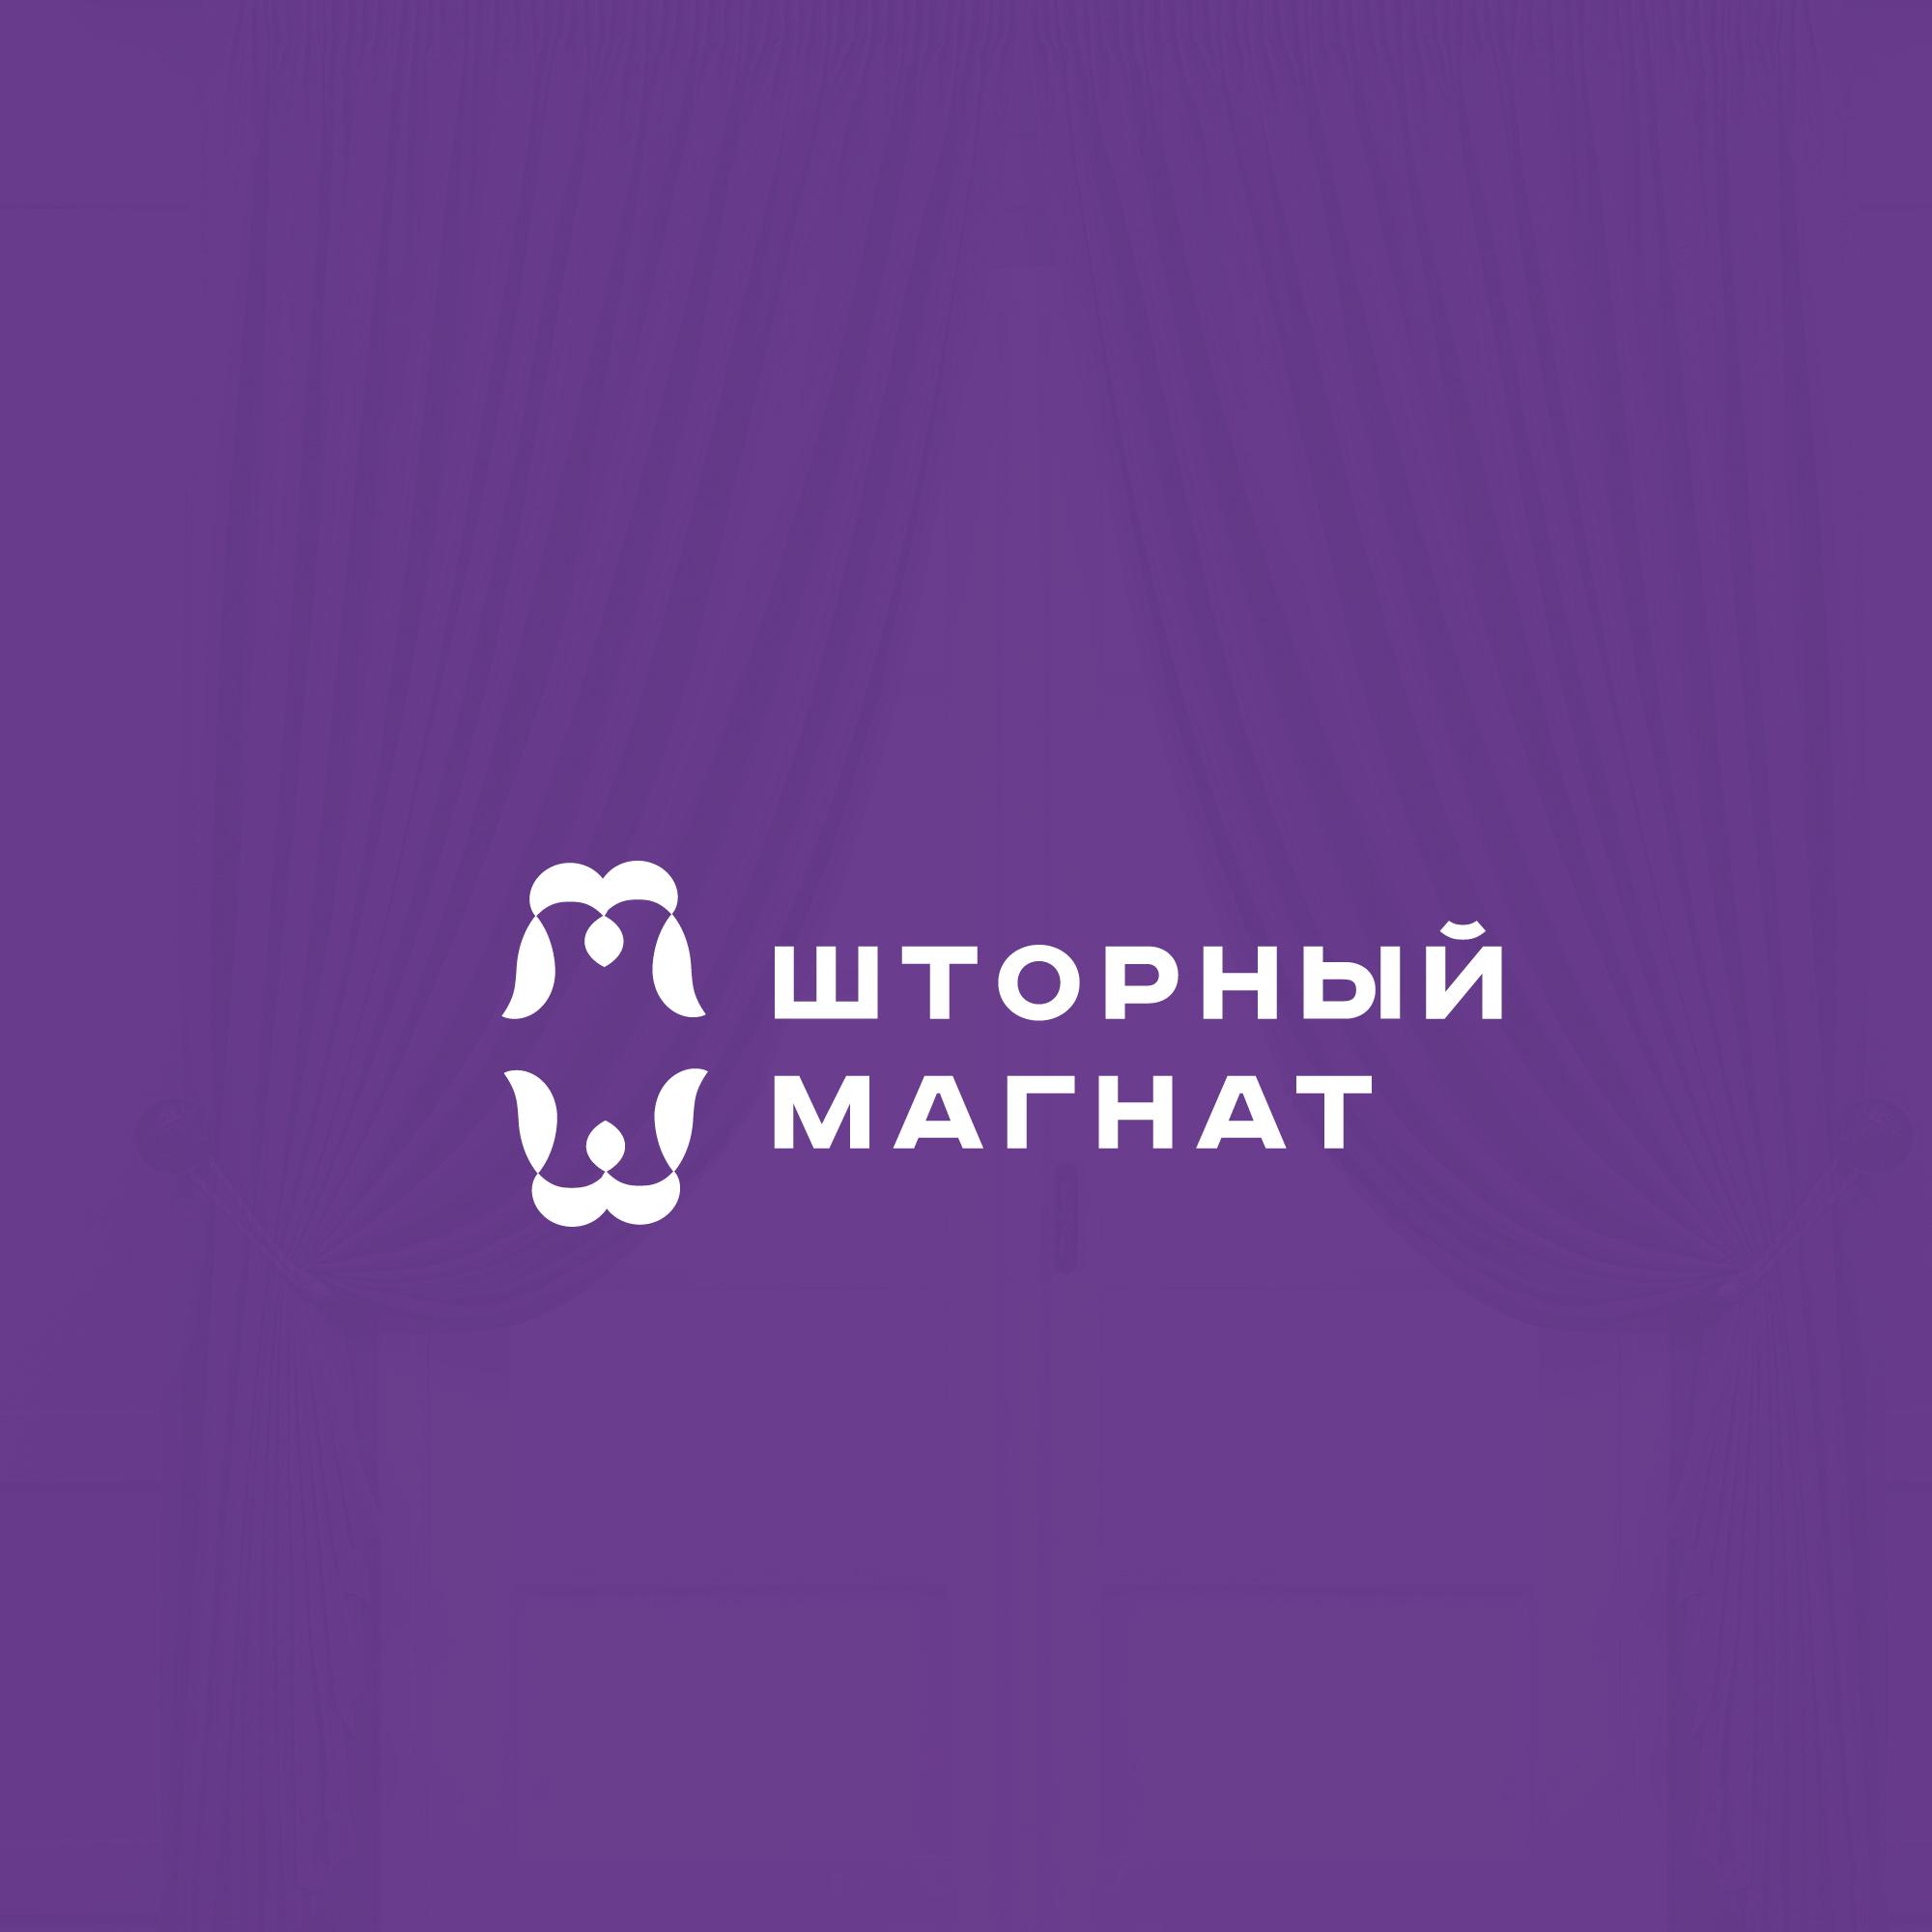 Логотип и фирменный стиль для магазина тканей. фото f_2415ce7bf17e17f2.jpg